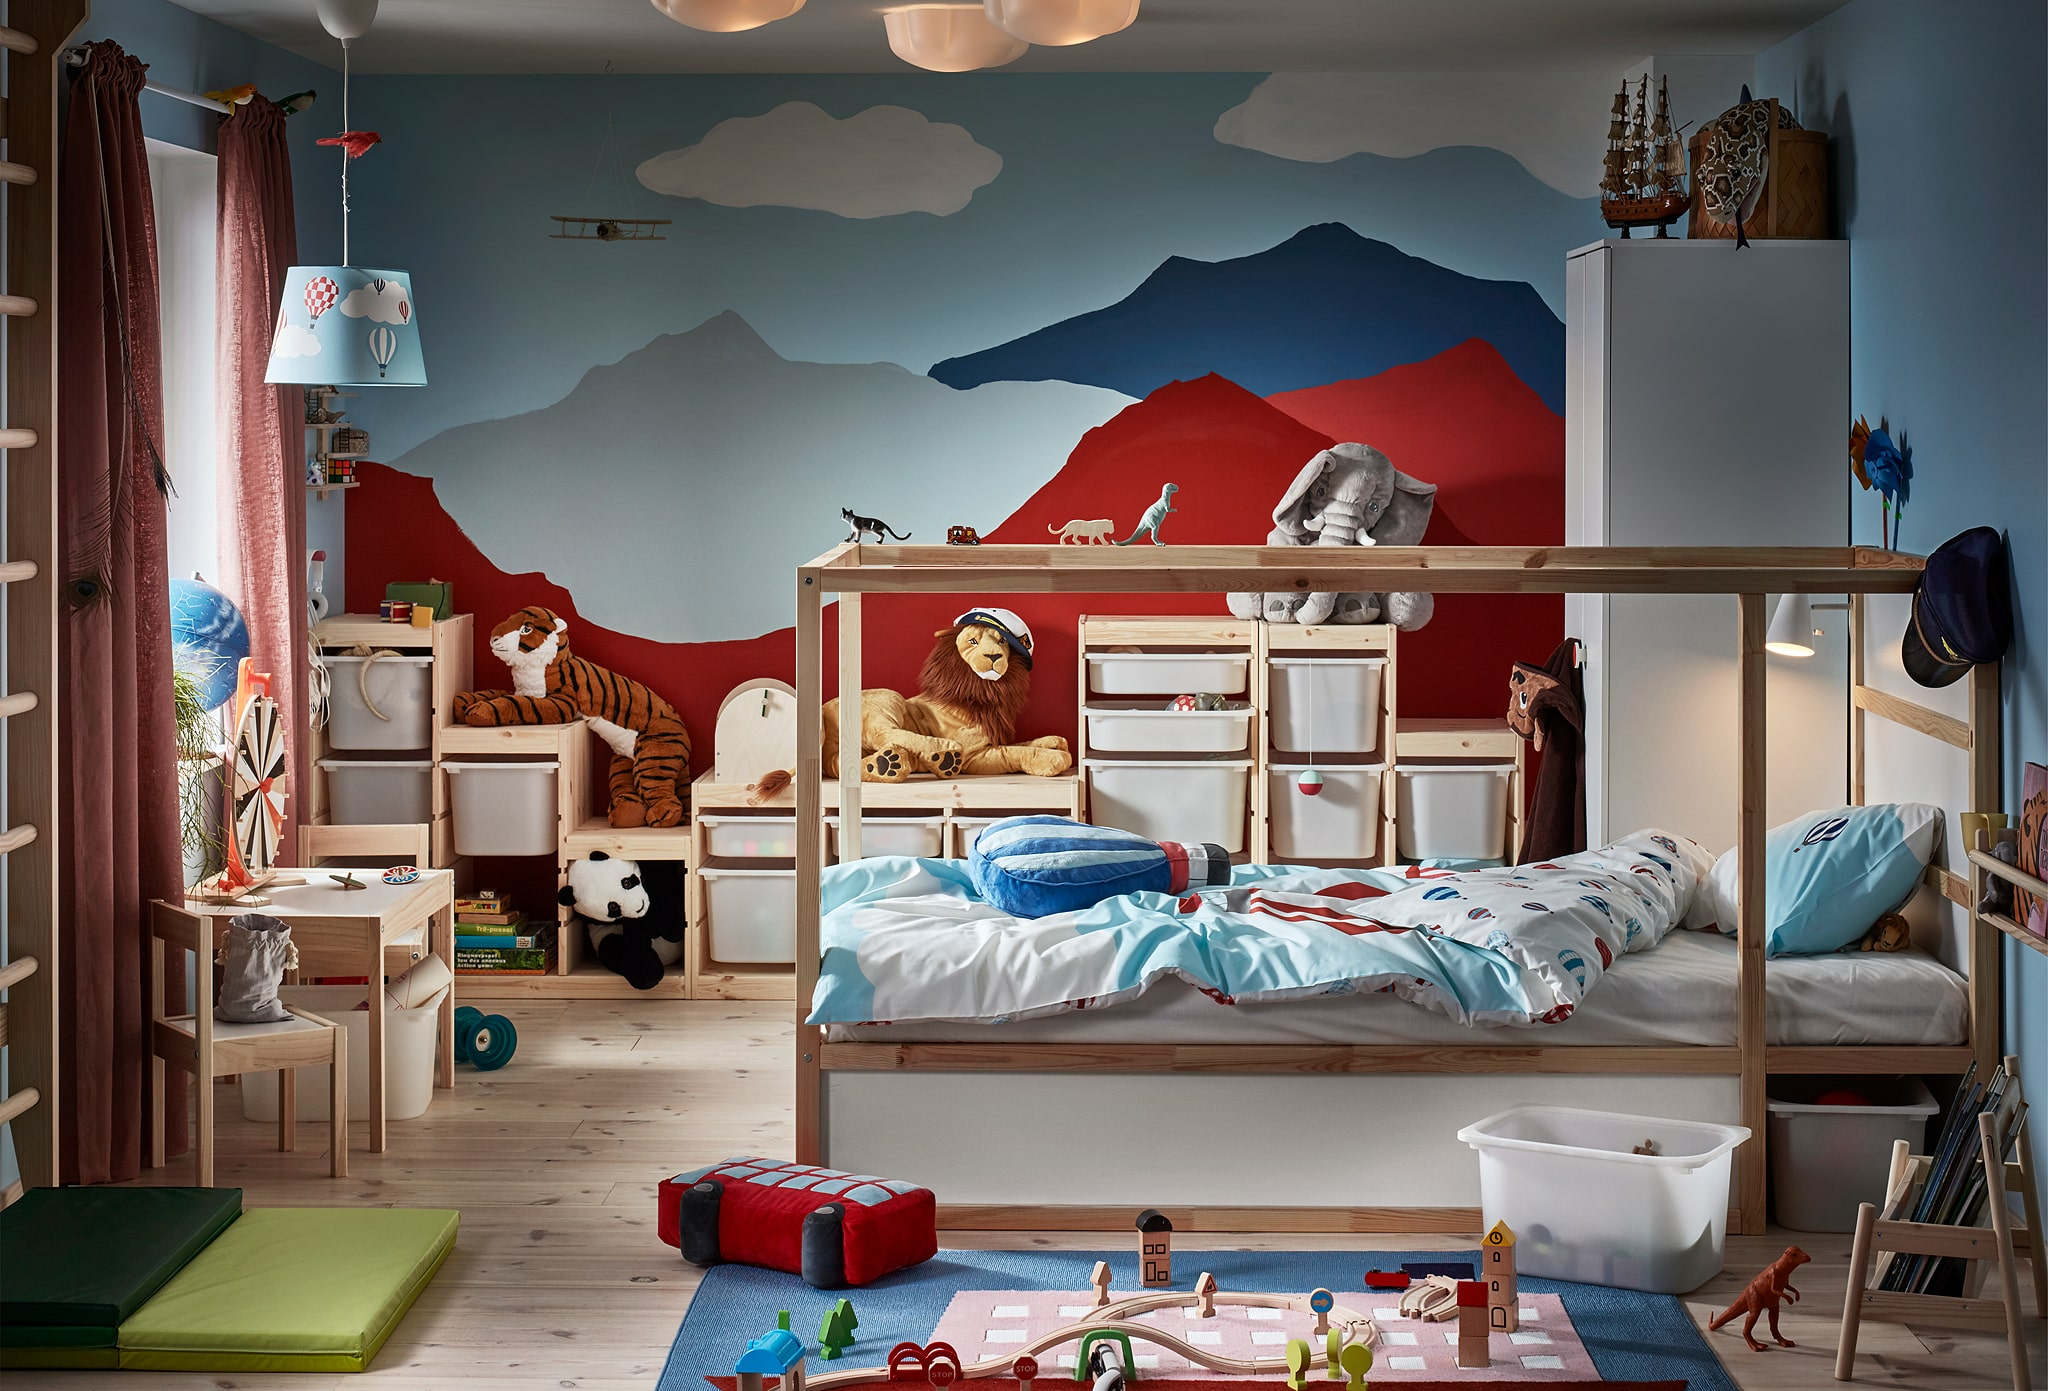 Kamar anak-anak secara visual didominasi oleh dinding belakang dengan lukisan pegunungan. Tempat tidur yang dapat dibalik, permainan memanjat dinding, mainan, berbagai penyimpanan.